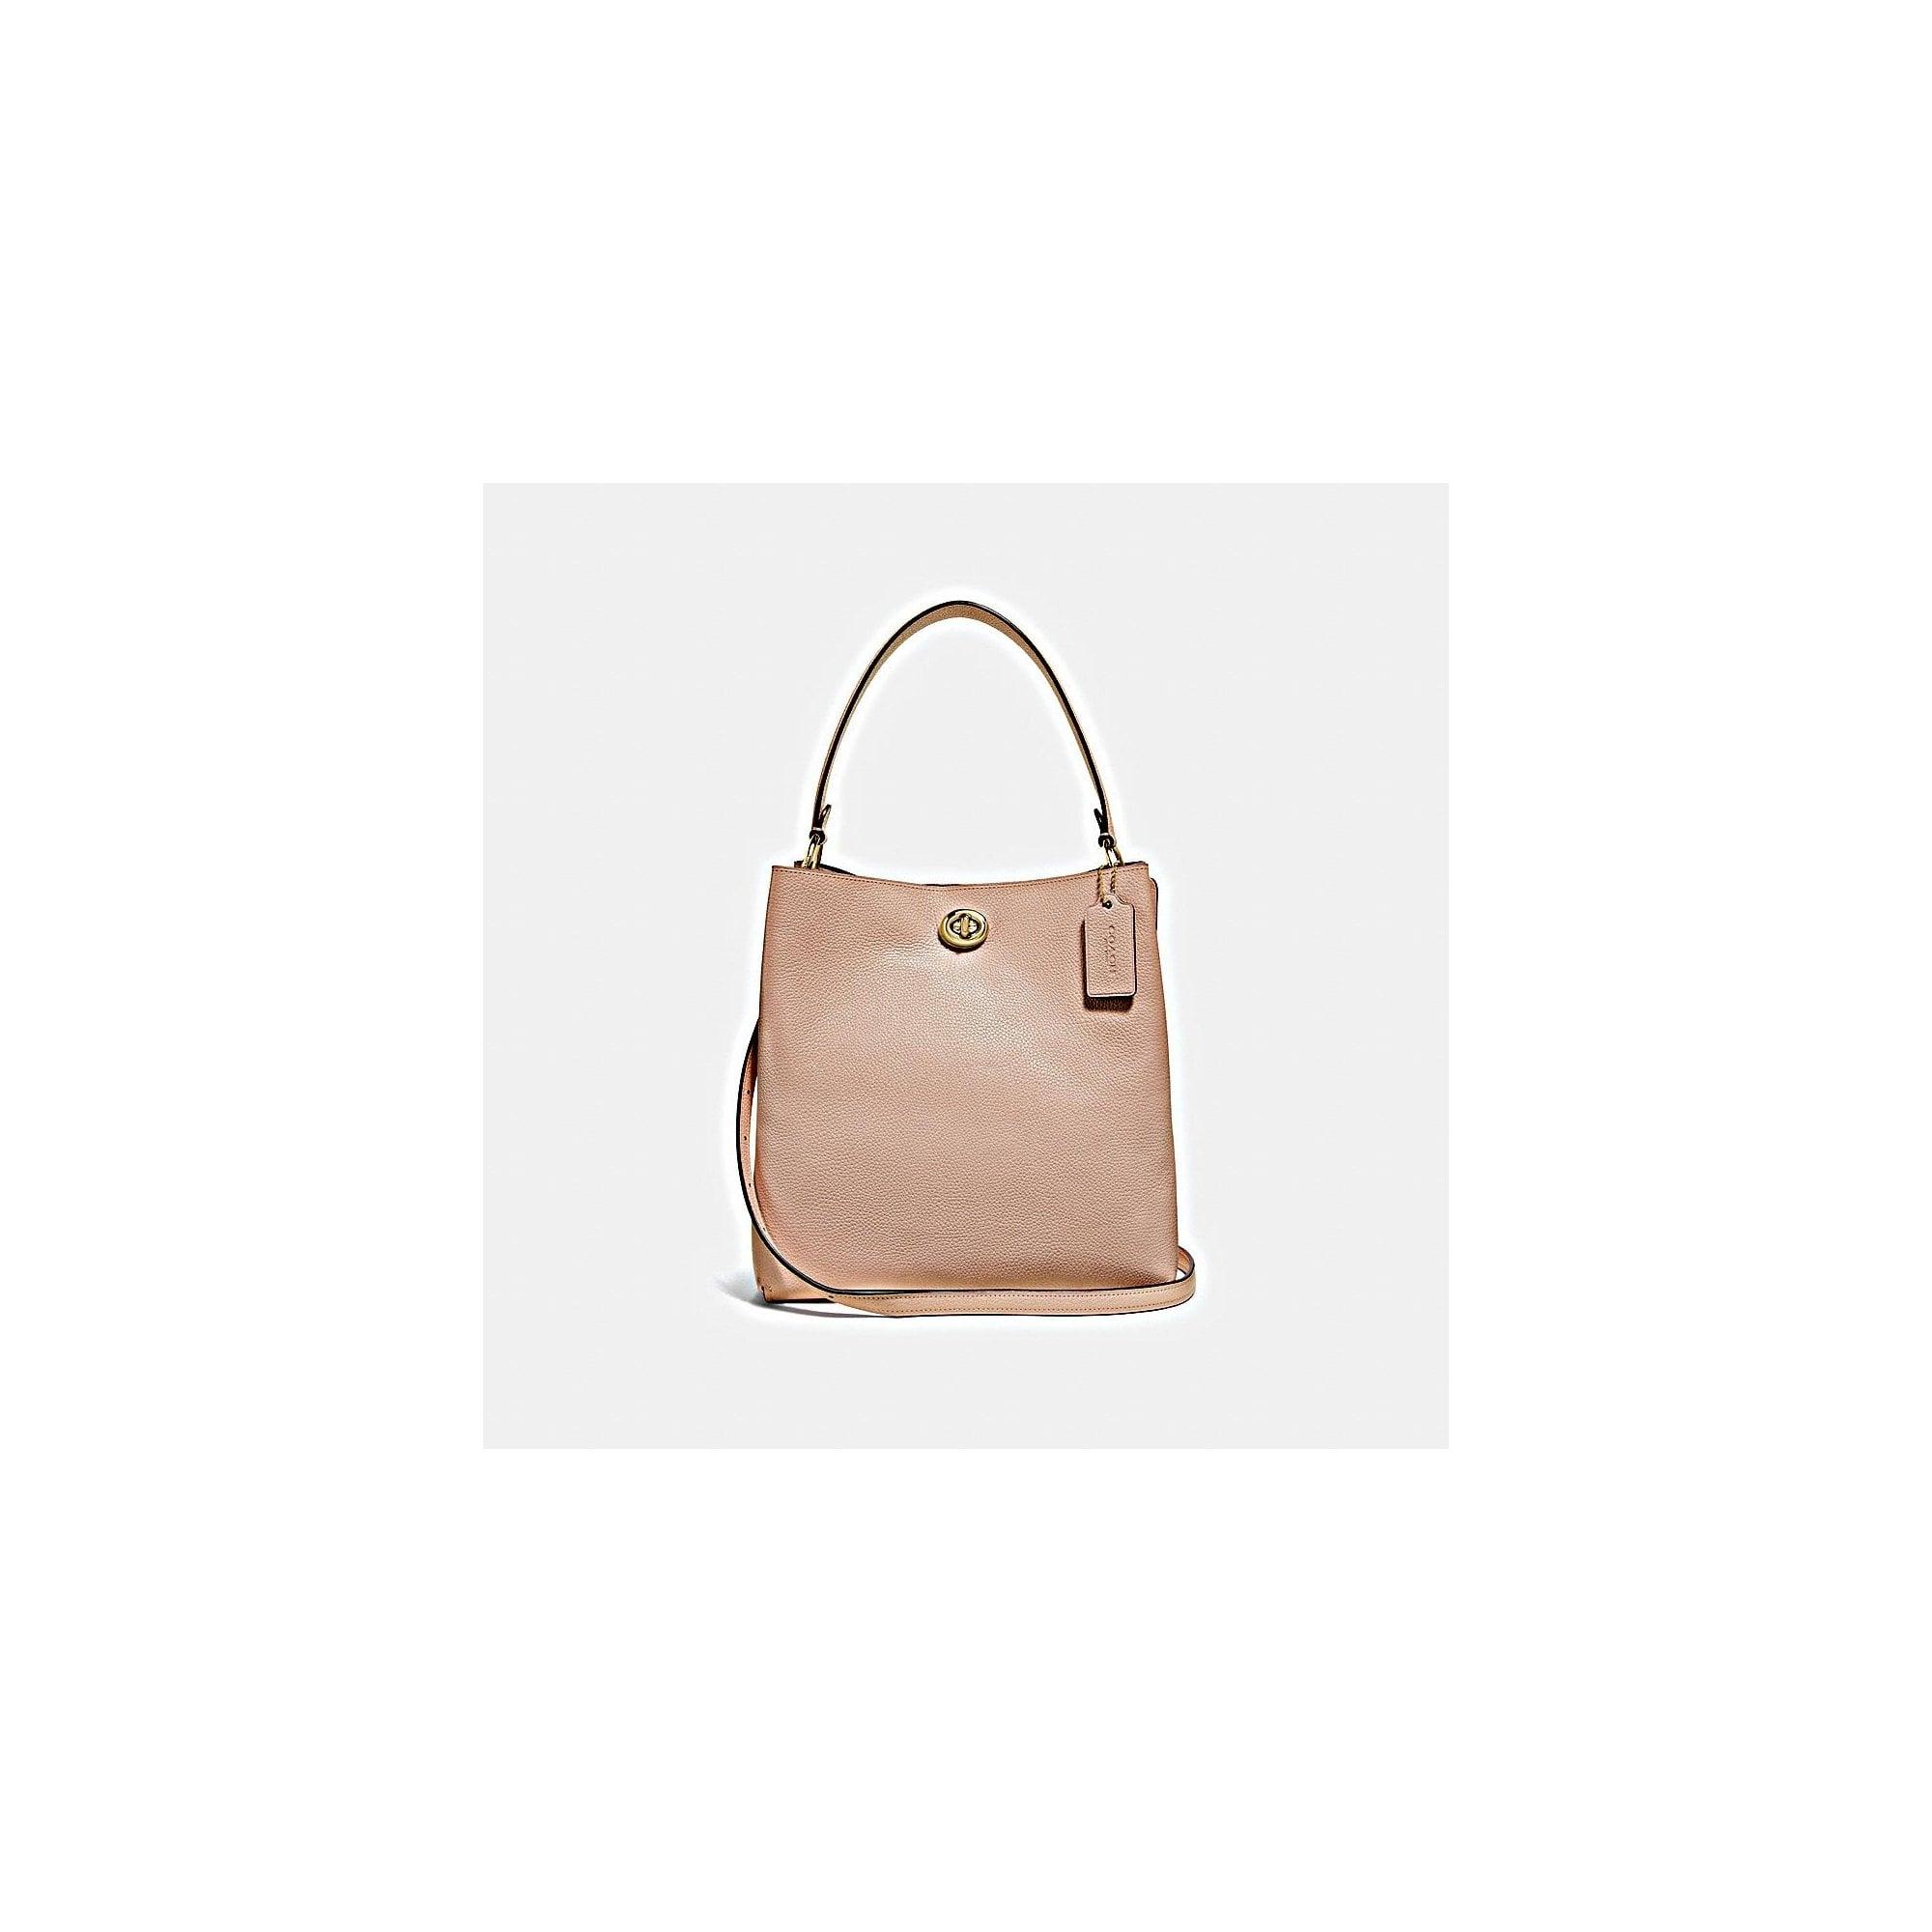 937e680ea320 COACH Polished Pebble Charlie Bucket Bag in Beechwood